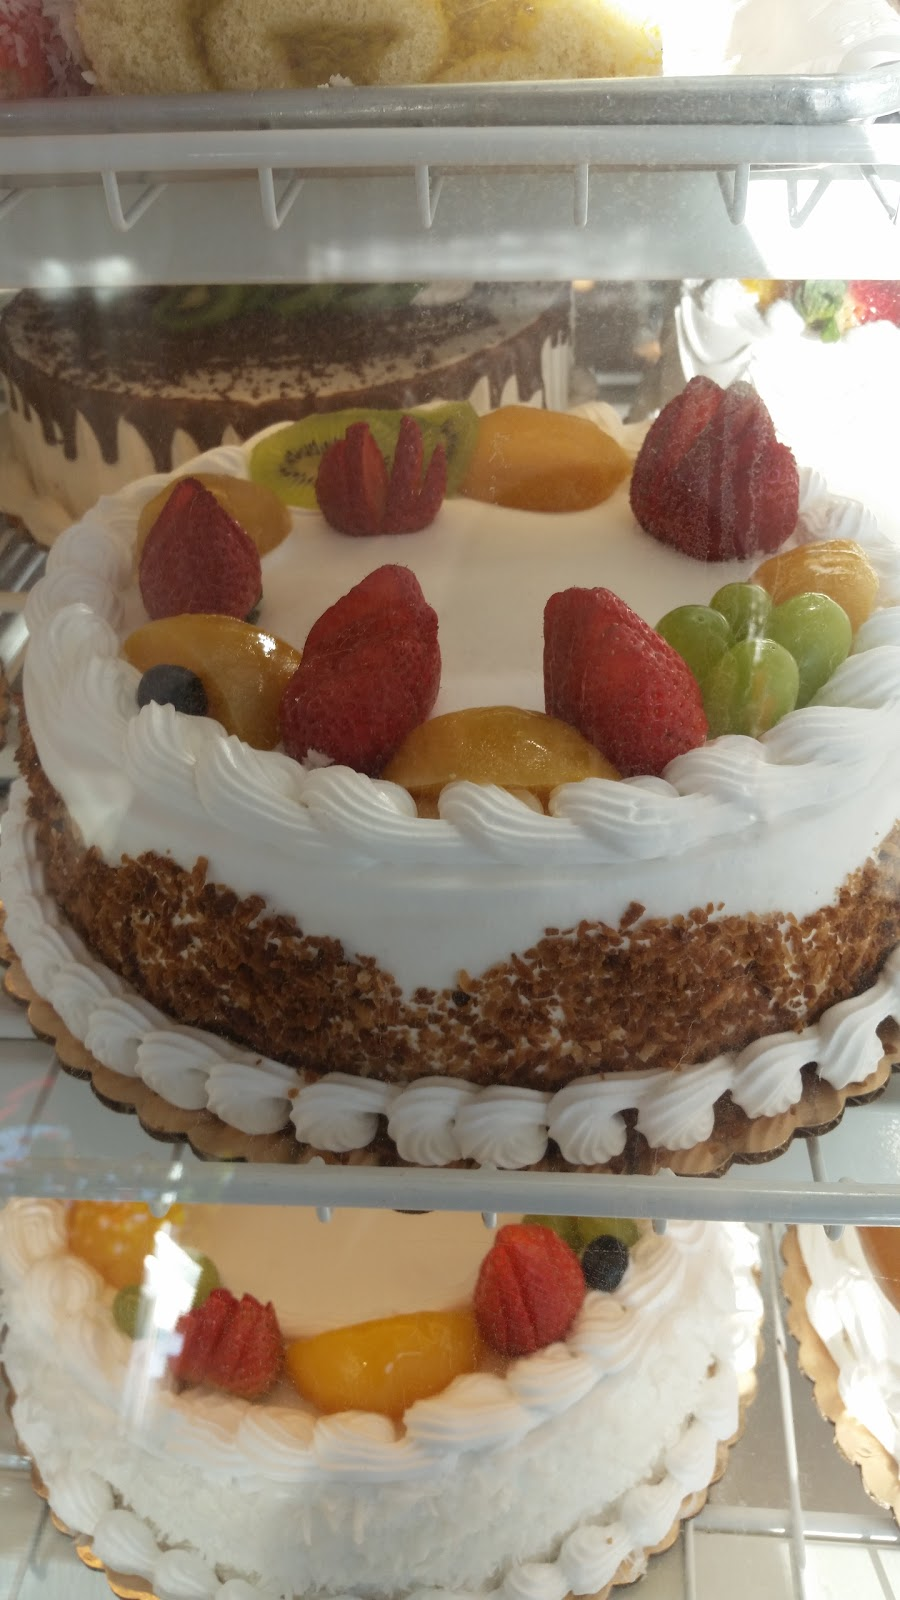 Caramelo Bakery - bakery  | Photo 2 of 10 | Address: 11301 Georgia Ave, Silver Spring, MD 20902, USA | Phone: (301) 942-9330